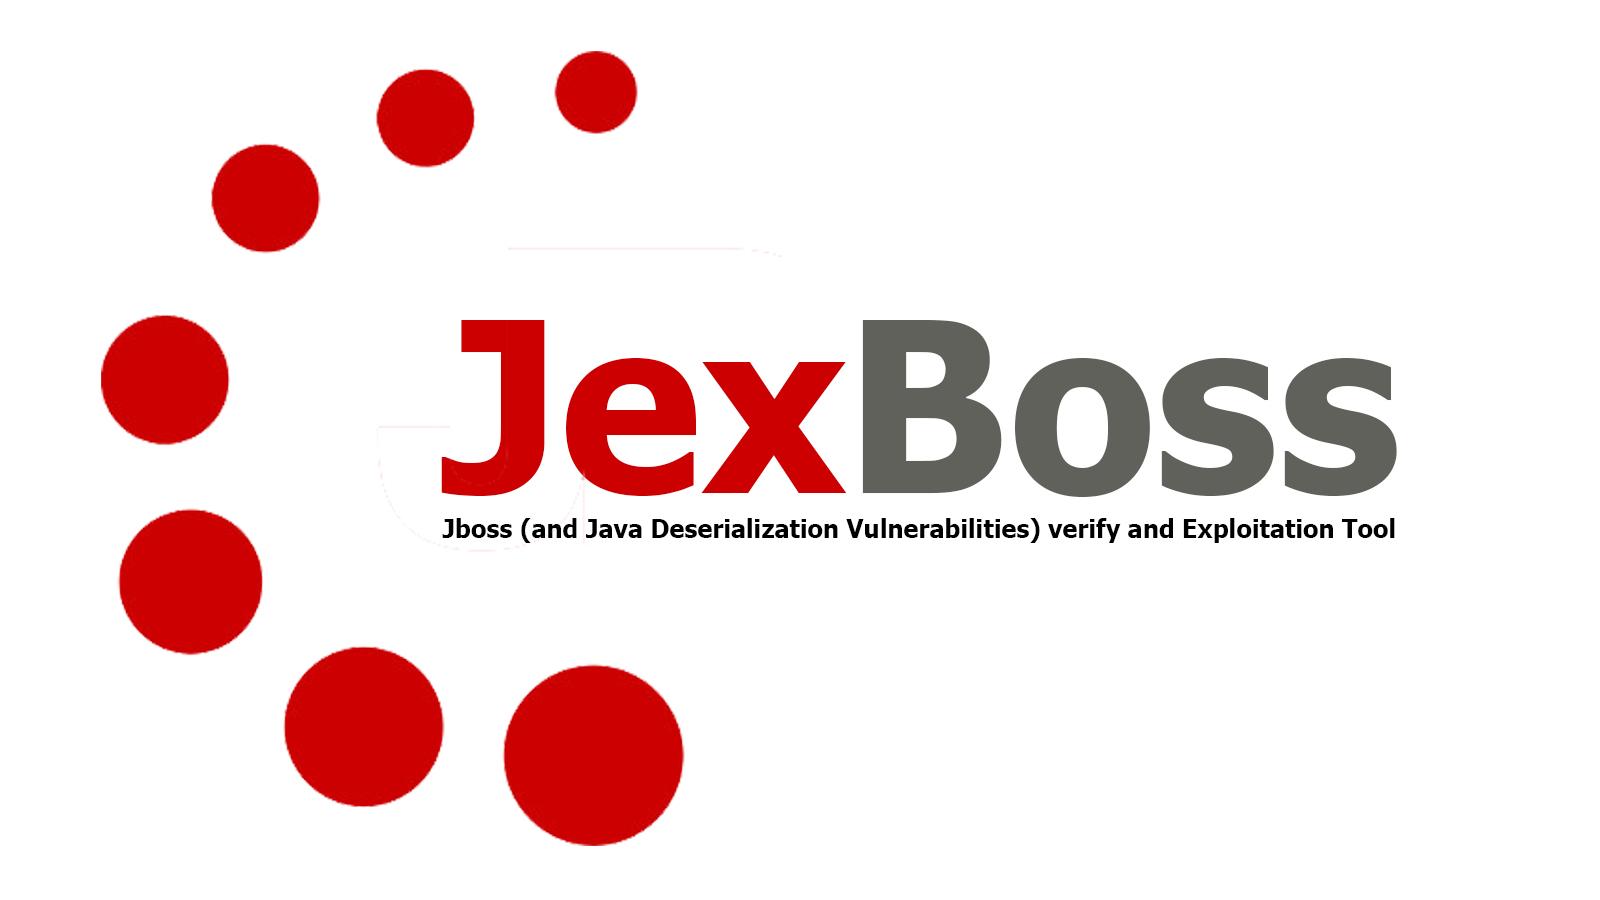 JexBoss - Jboss (and Java Deserialization Vulnerabilities) verify and Exploitation Tool